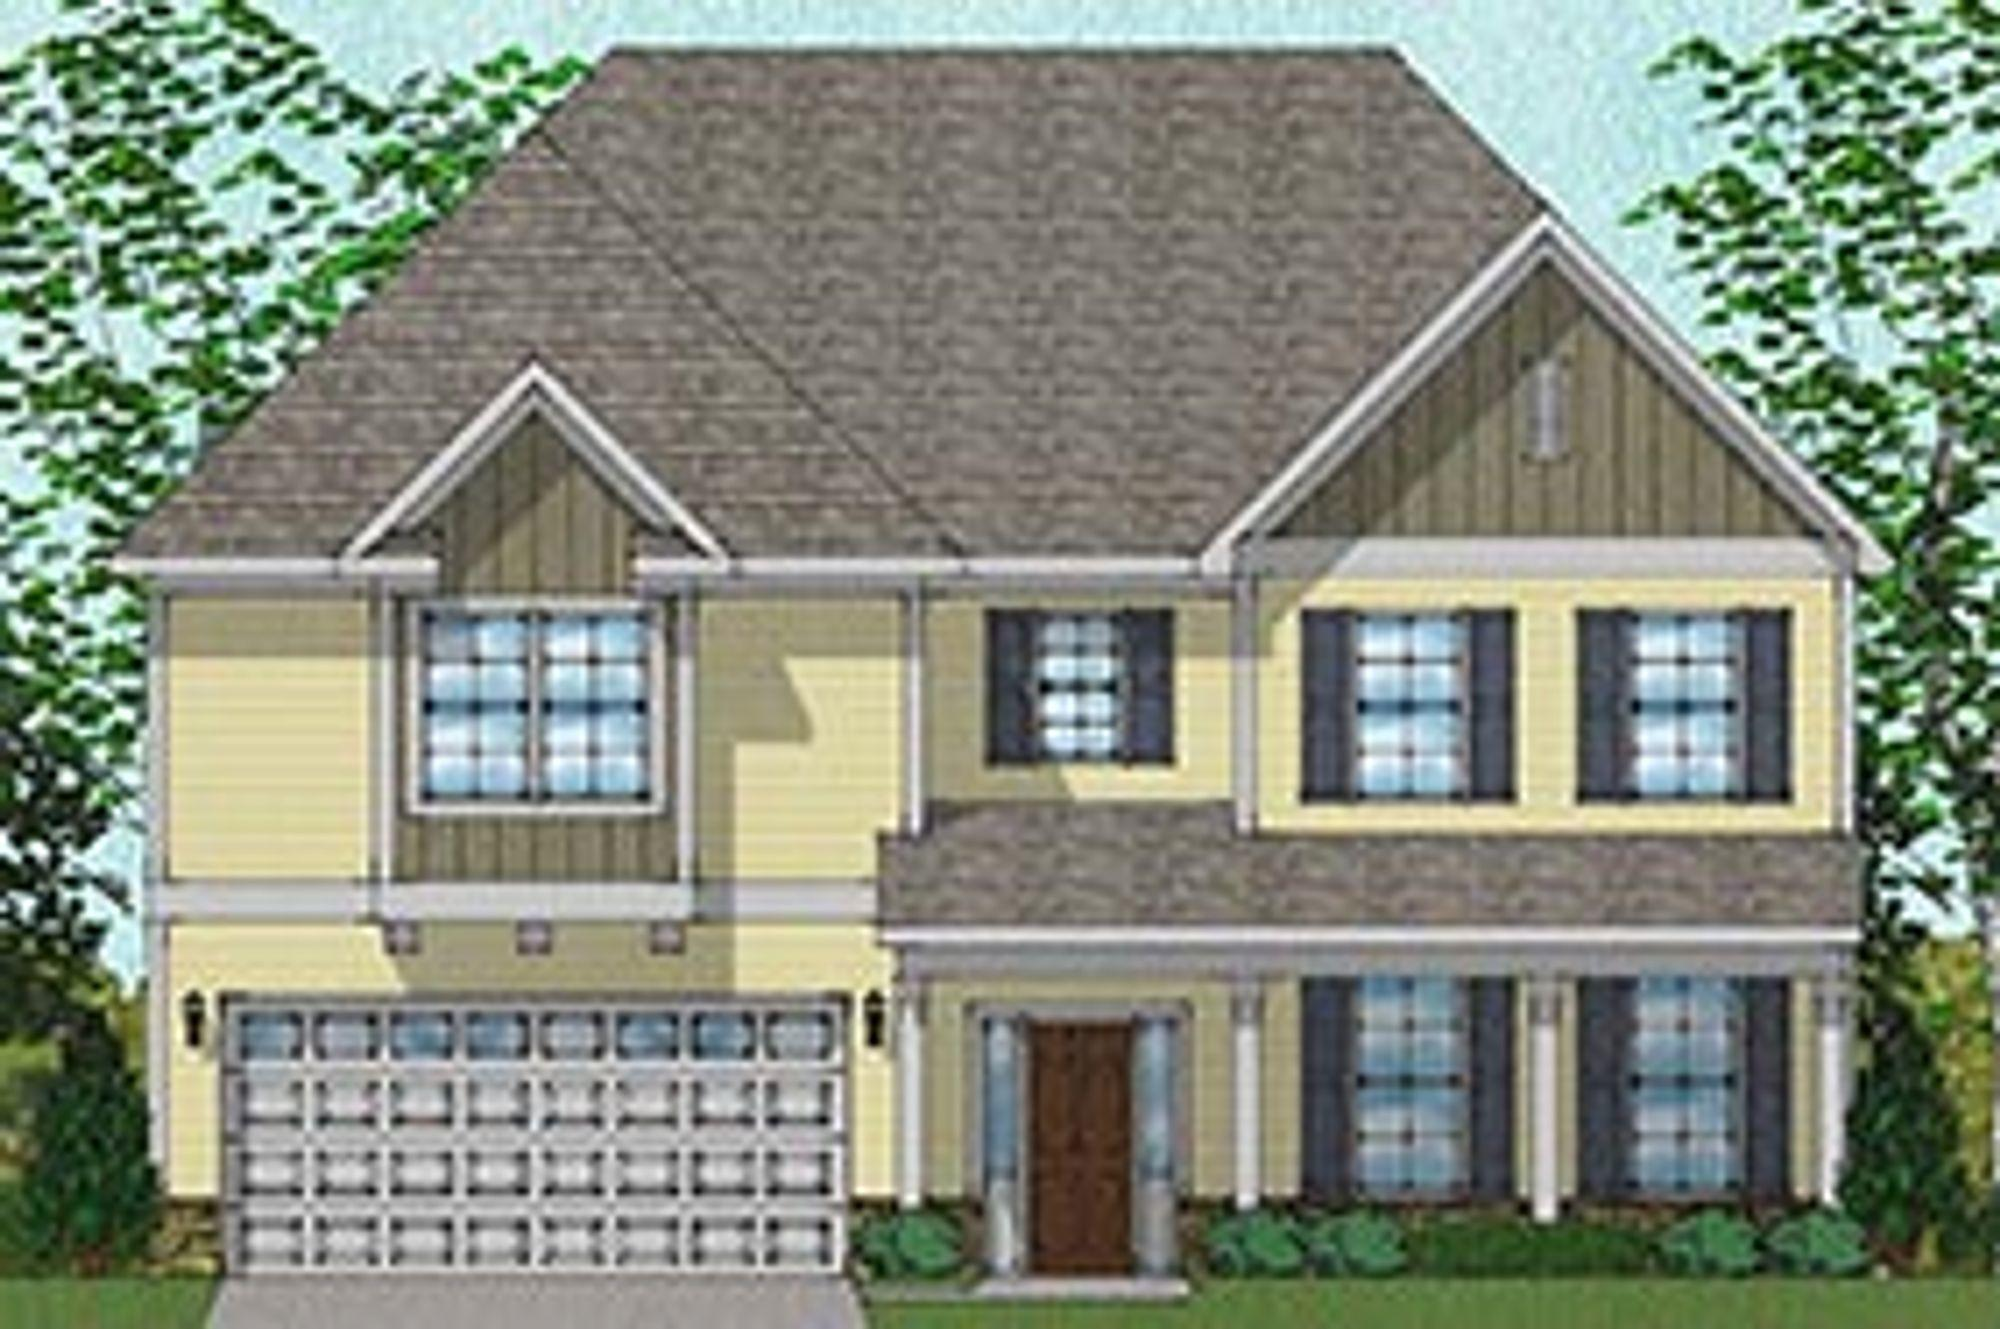 Cane Bay Plantation Homes For Sale - 489 Rowley, Summerville, SC - 0